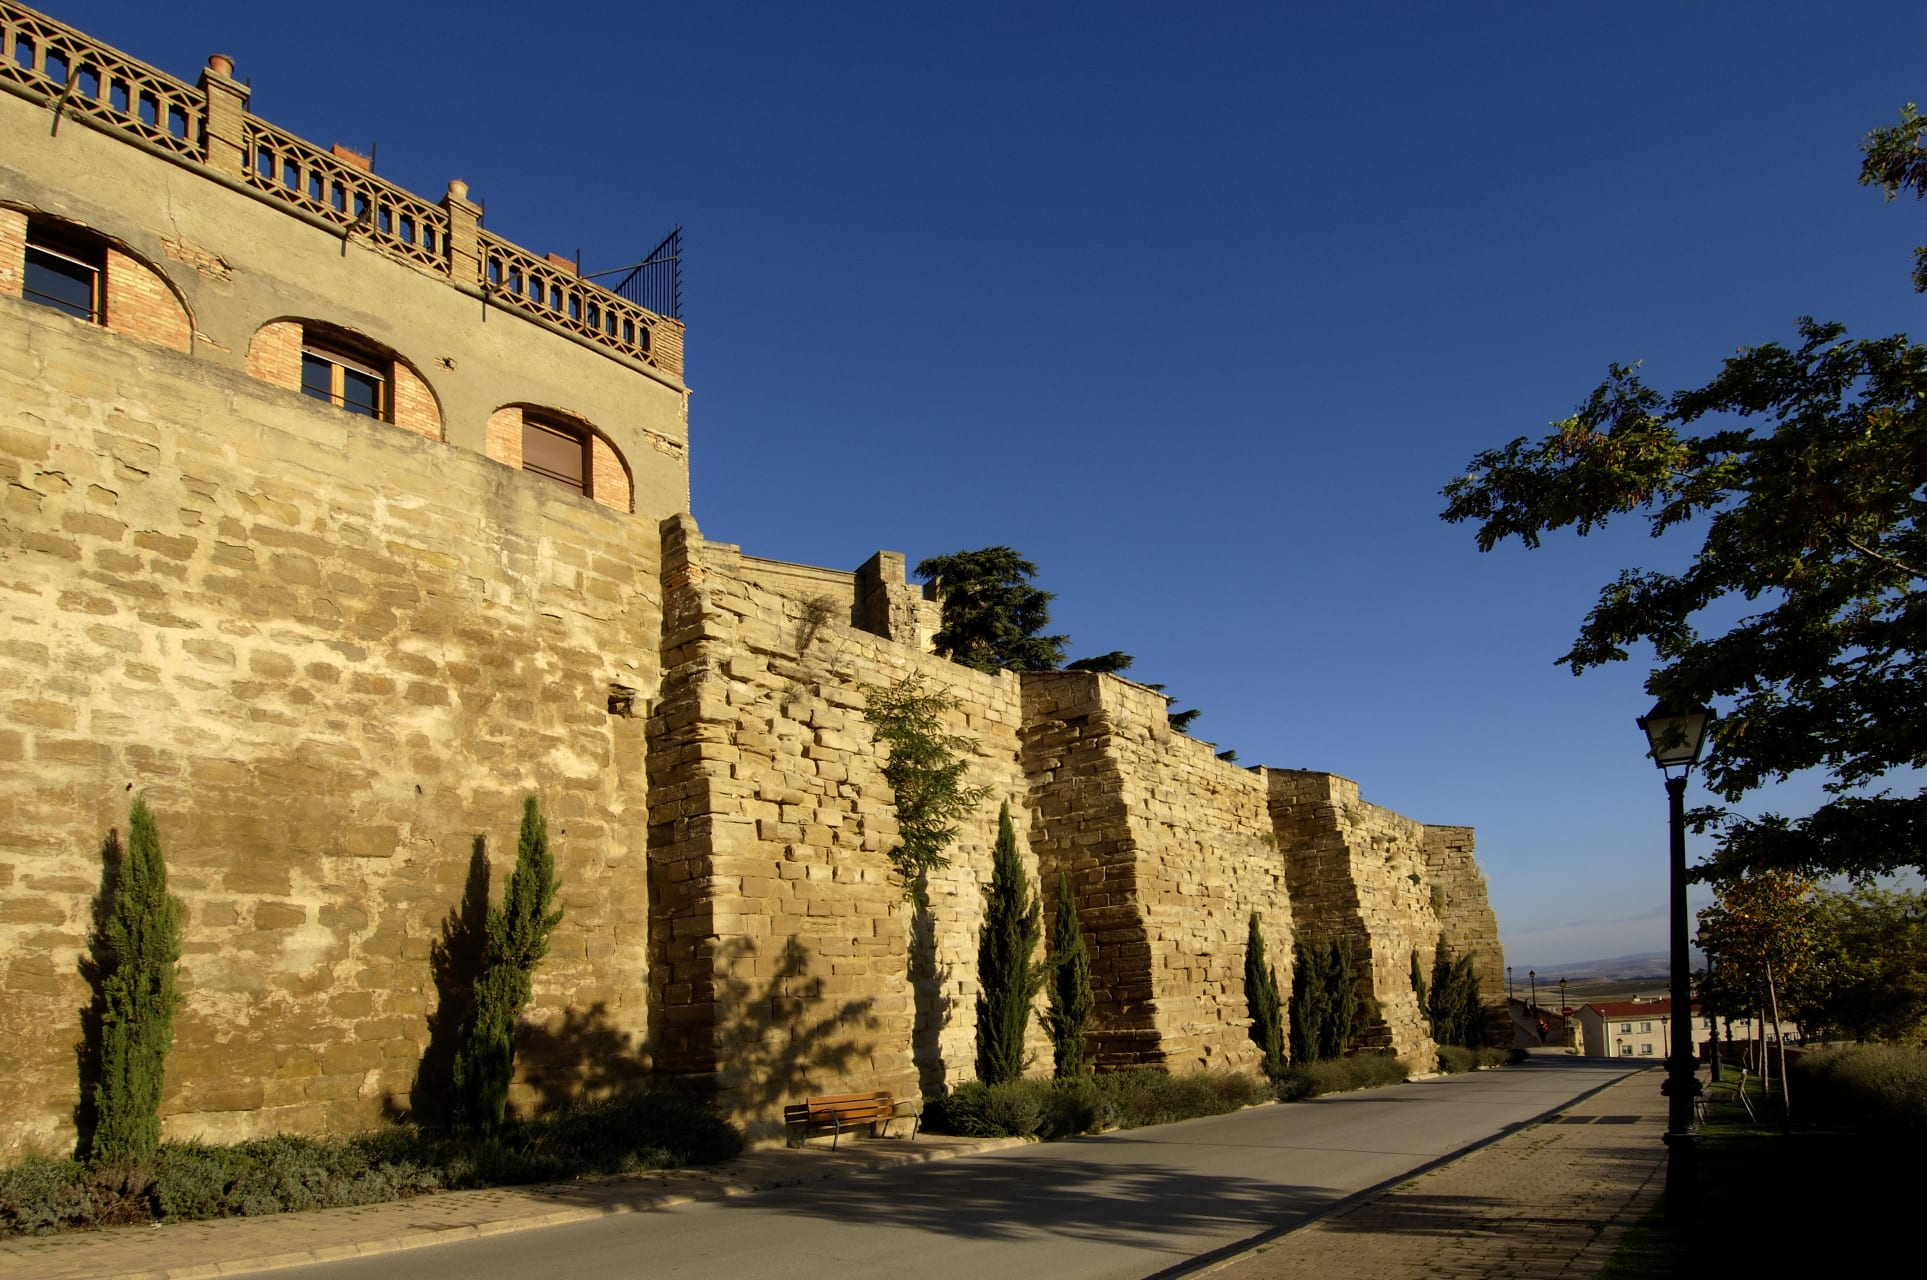 Navarre - Viana, Where Cesar Borgia is Buried